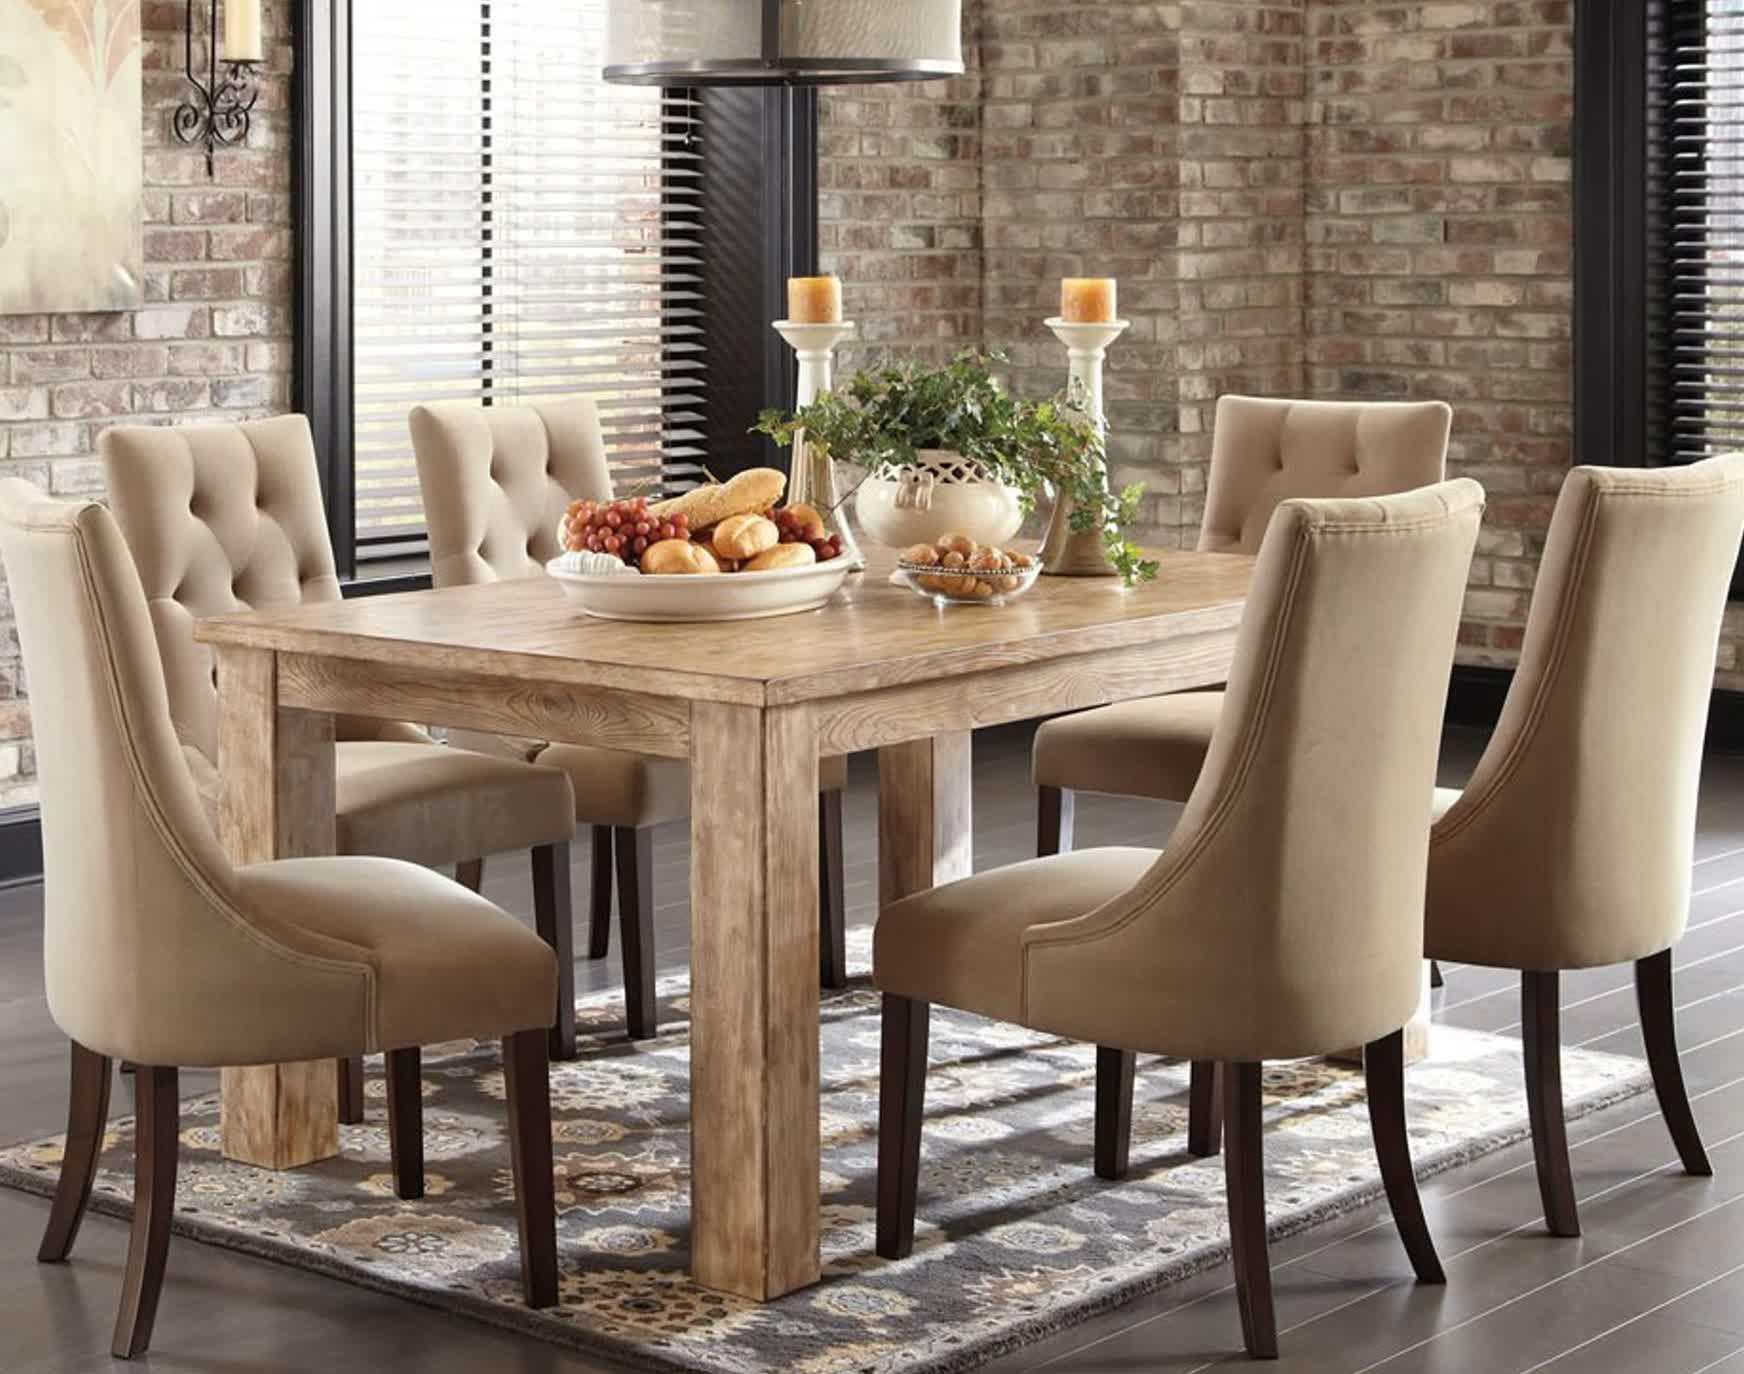 Tavolo e sedie per sala da pranzo foto e sala da pranzo sala da ...